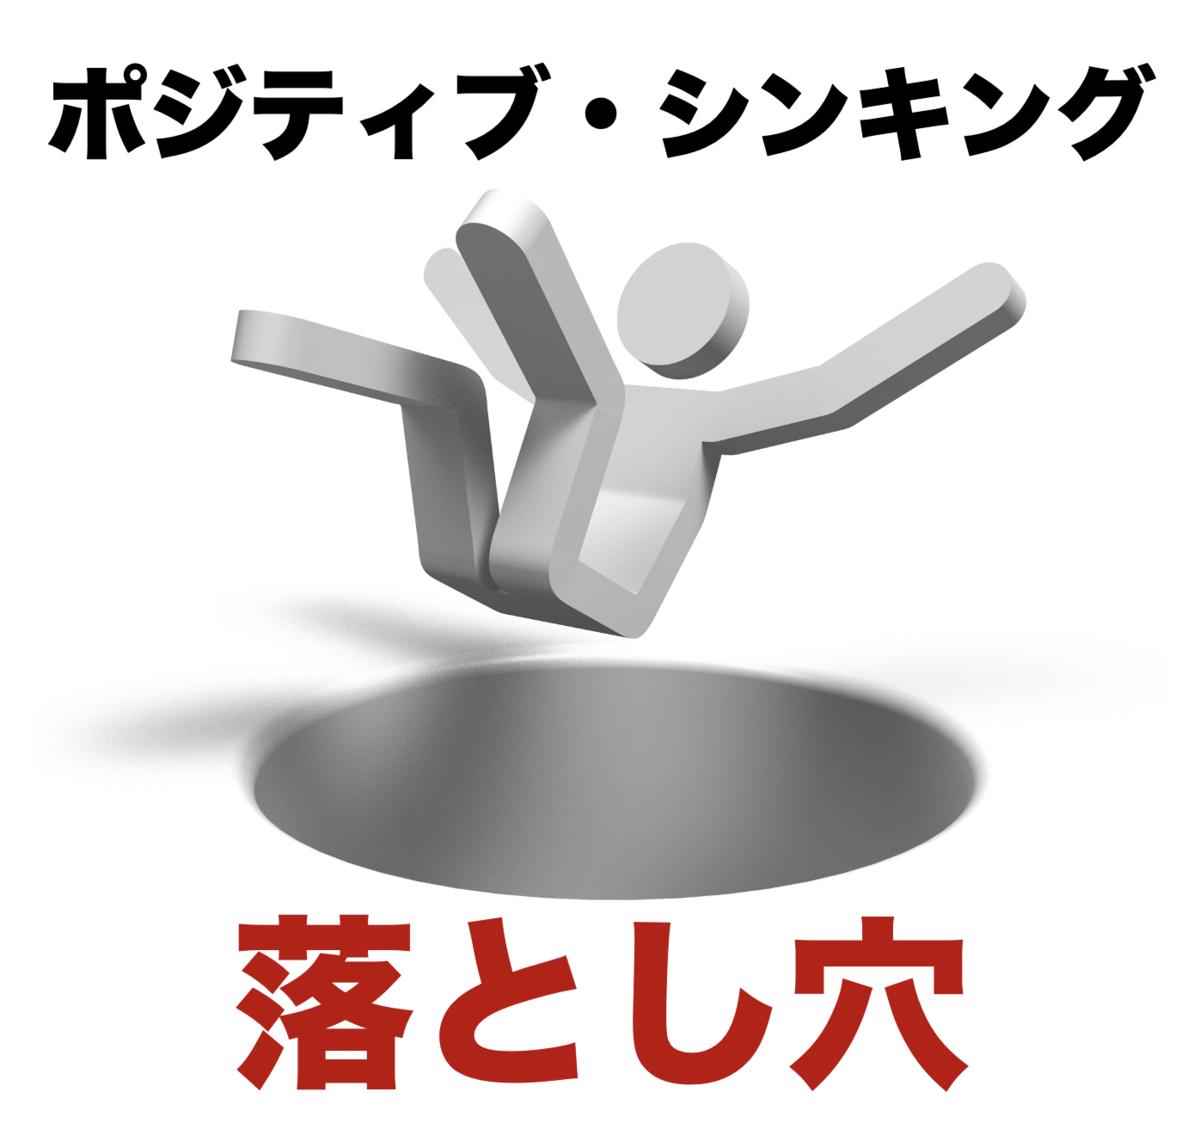 f:id:presen-sen-nin:20200427221414p:plain